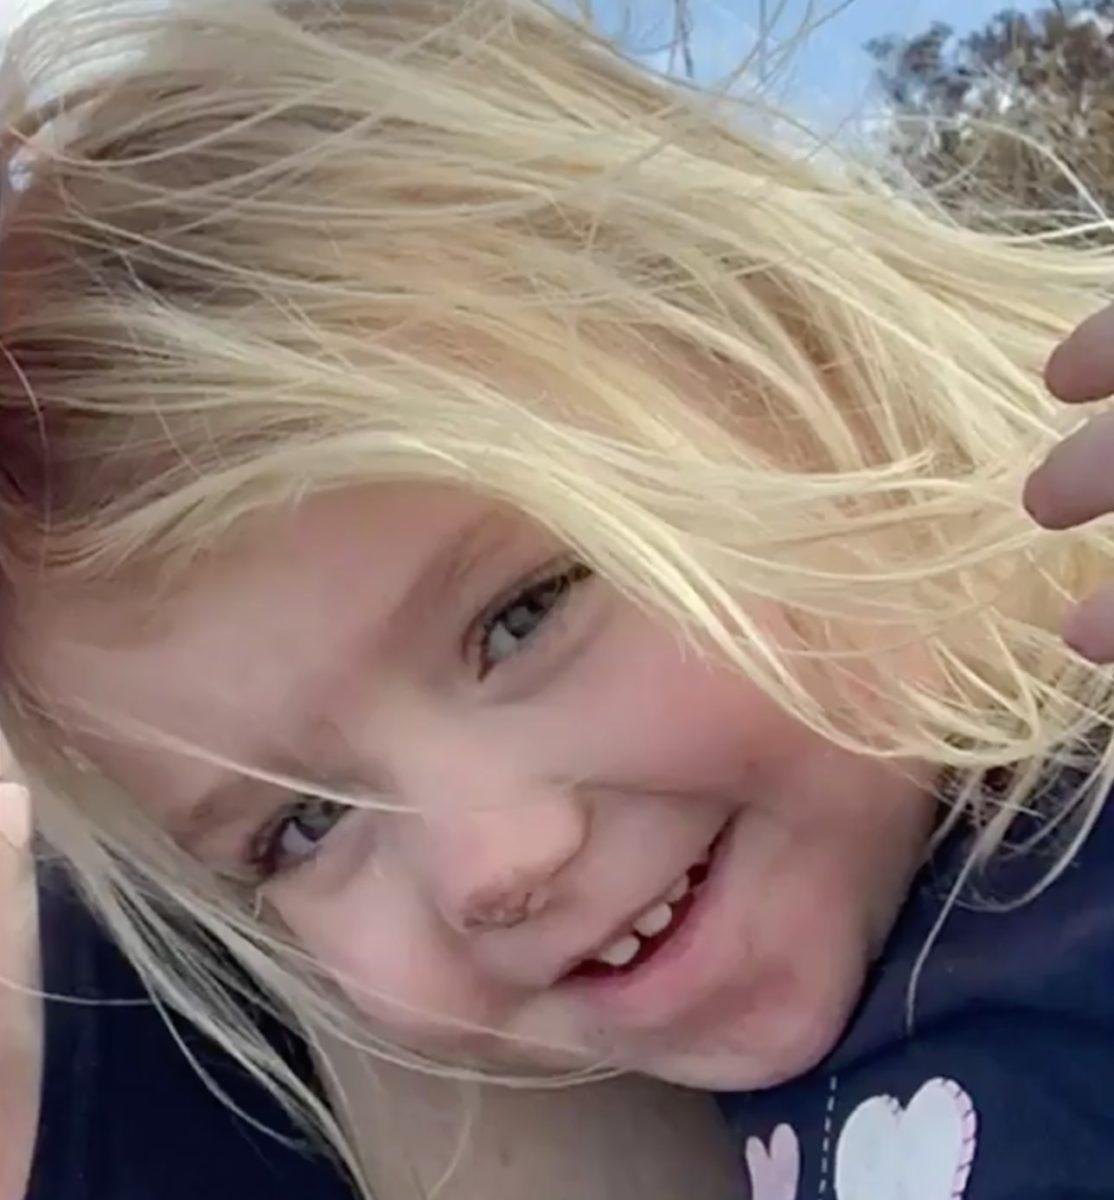 3-year-old dies in car while mom and boyfriend watch netflix